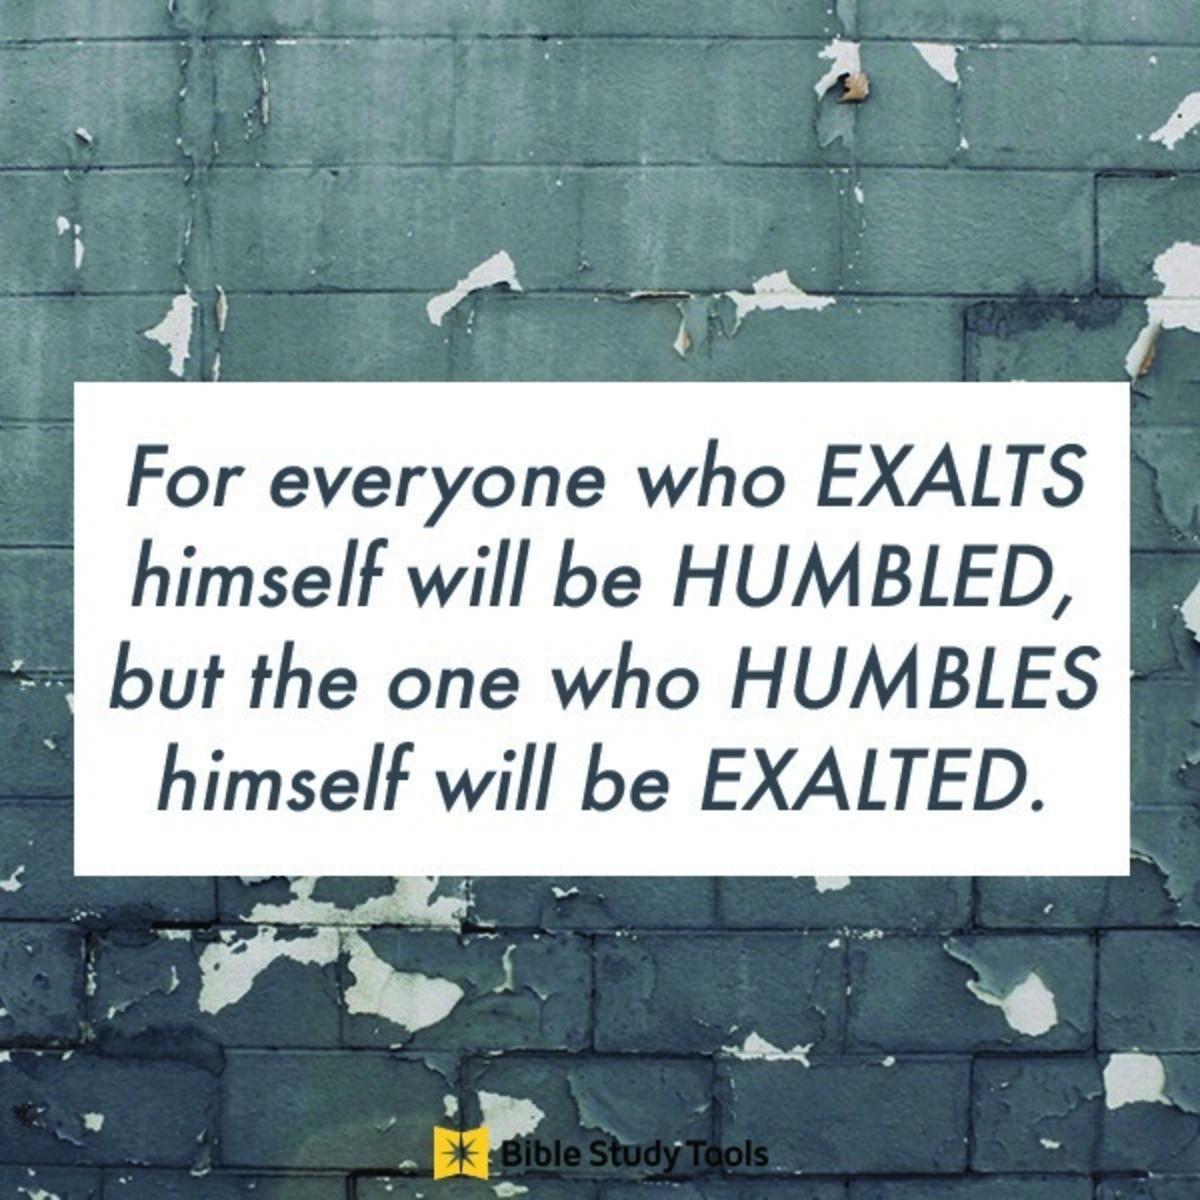 Your Daily Verse - Luke 14:11